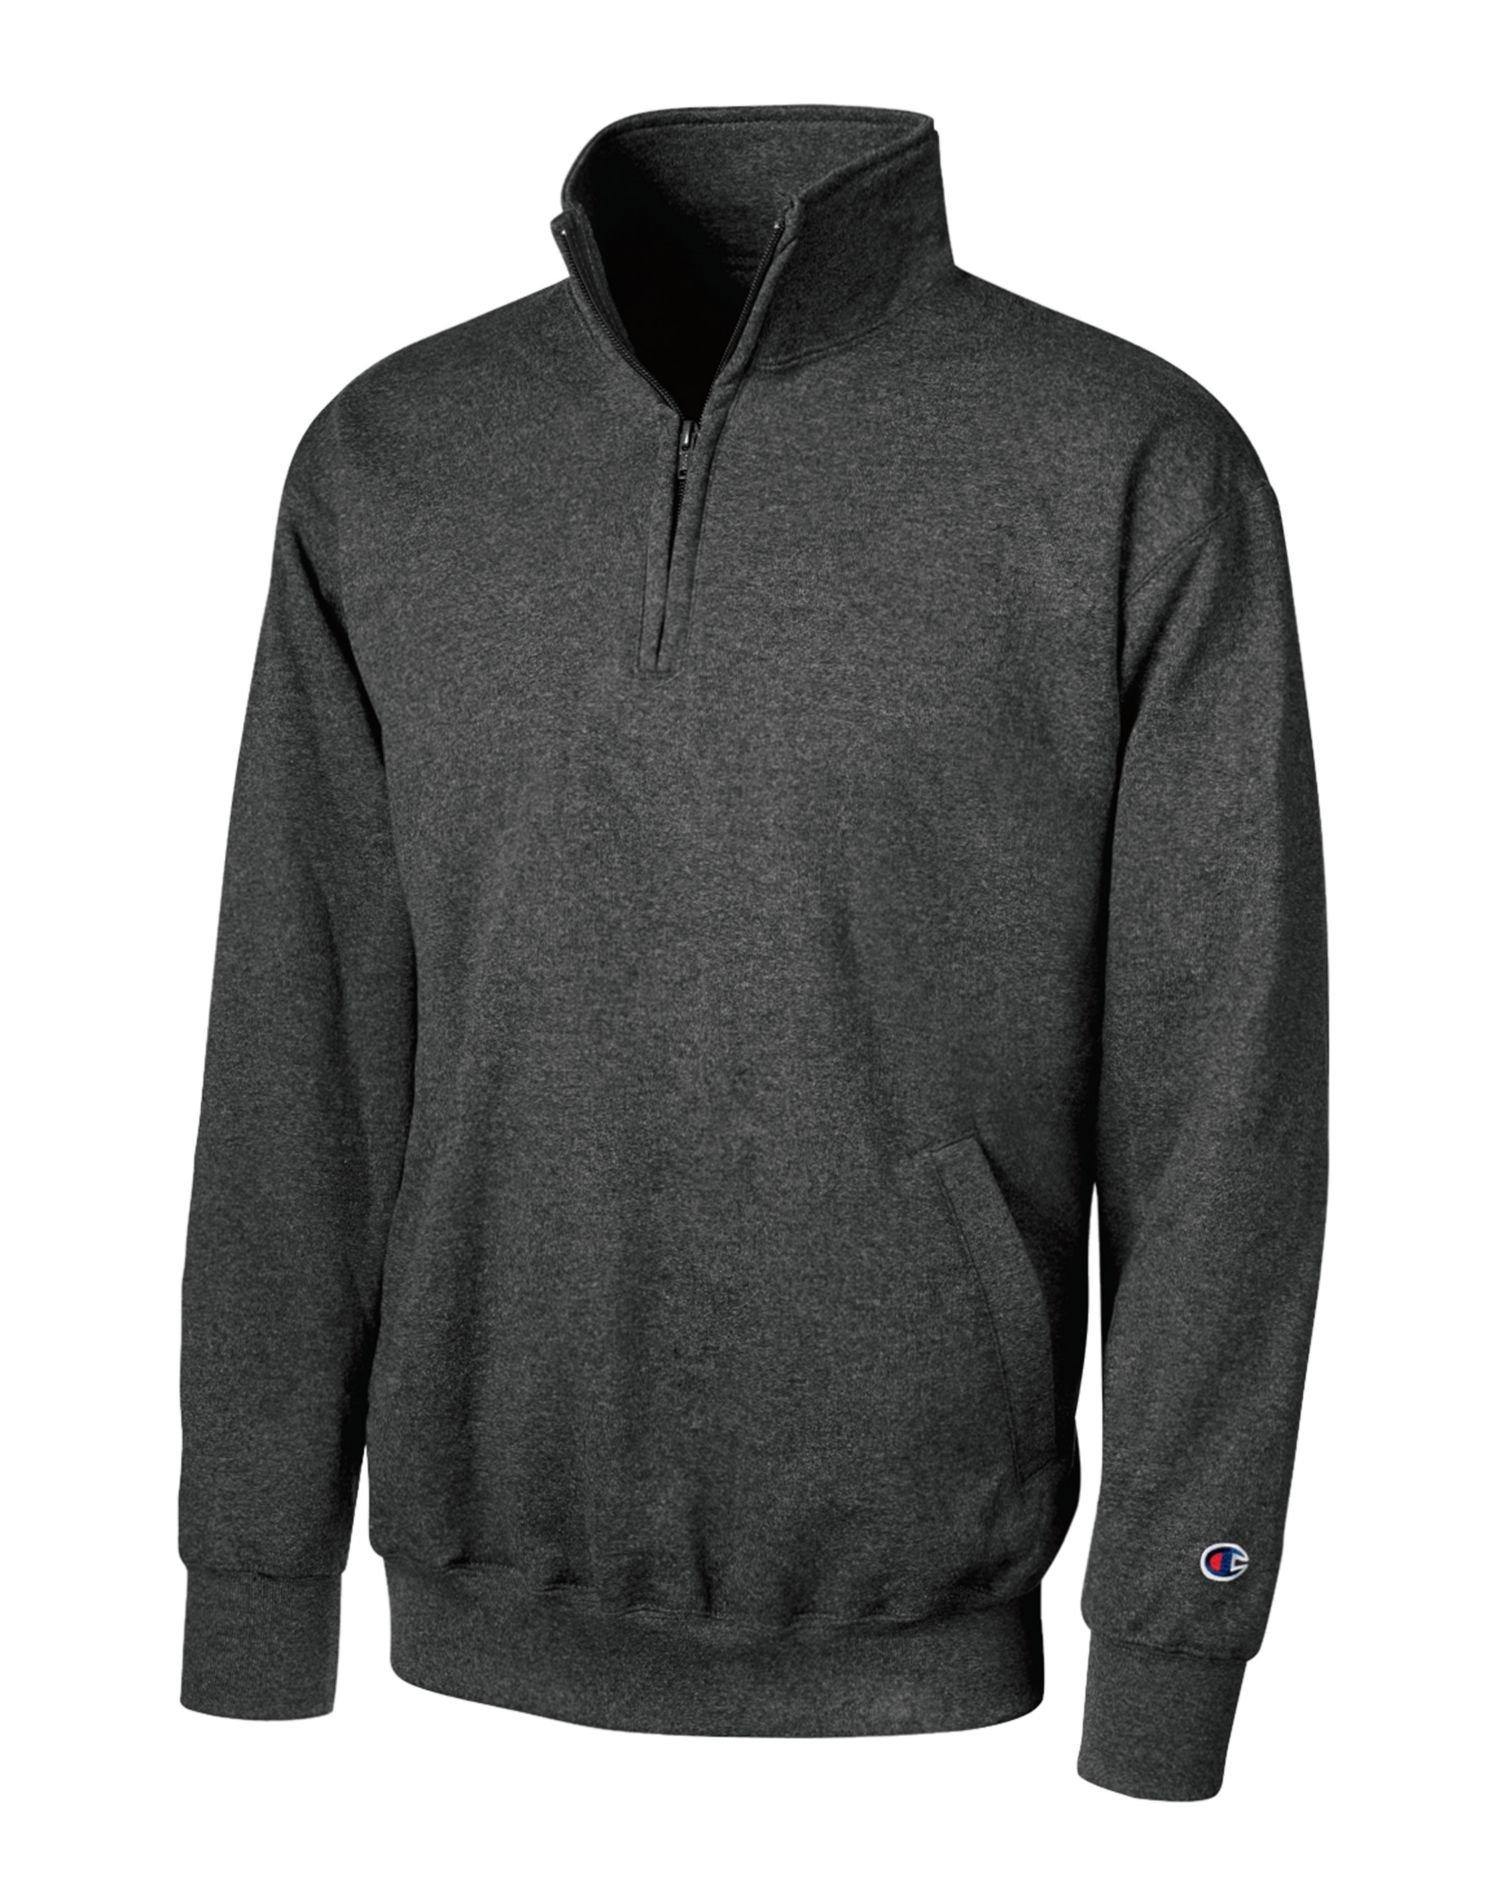 Champion Mens Eco Fleece 1/4 Zip (S400) -CHARCOAL H -2XL